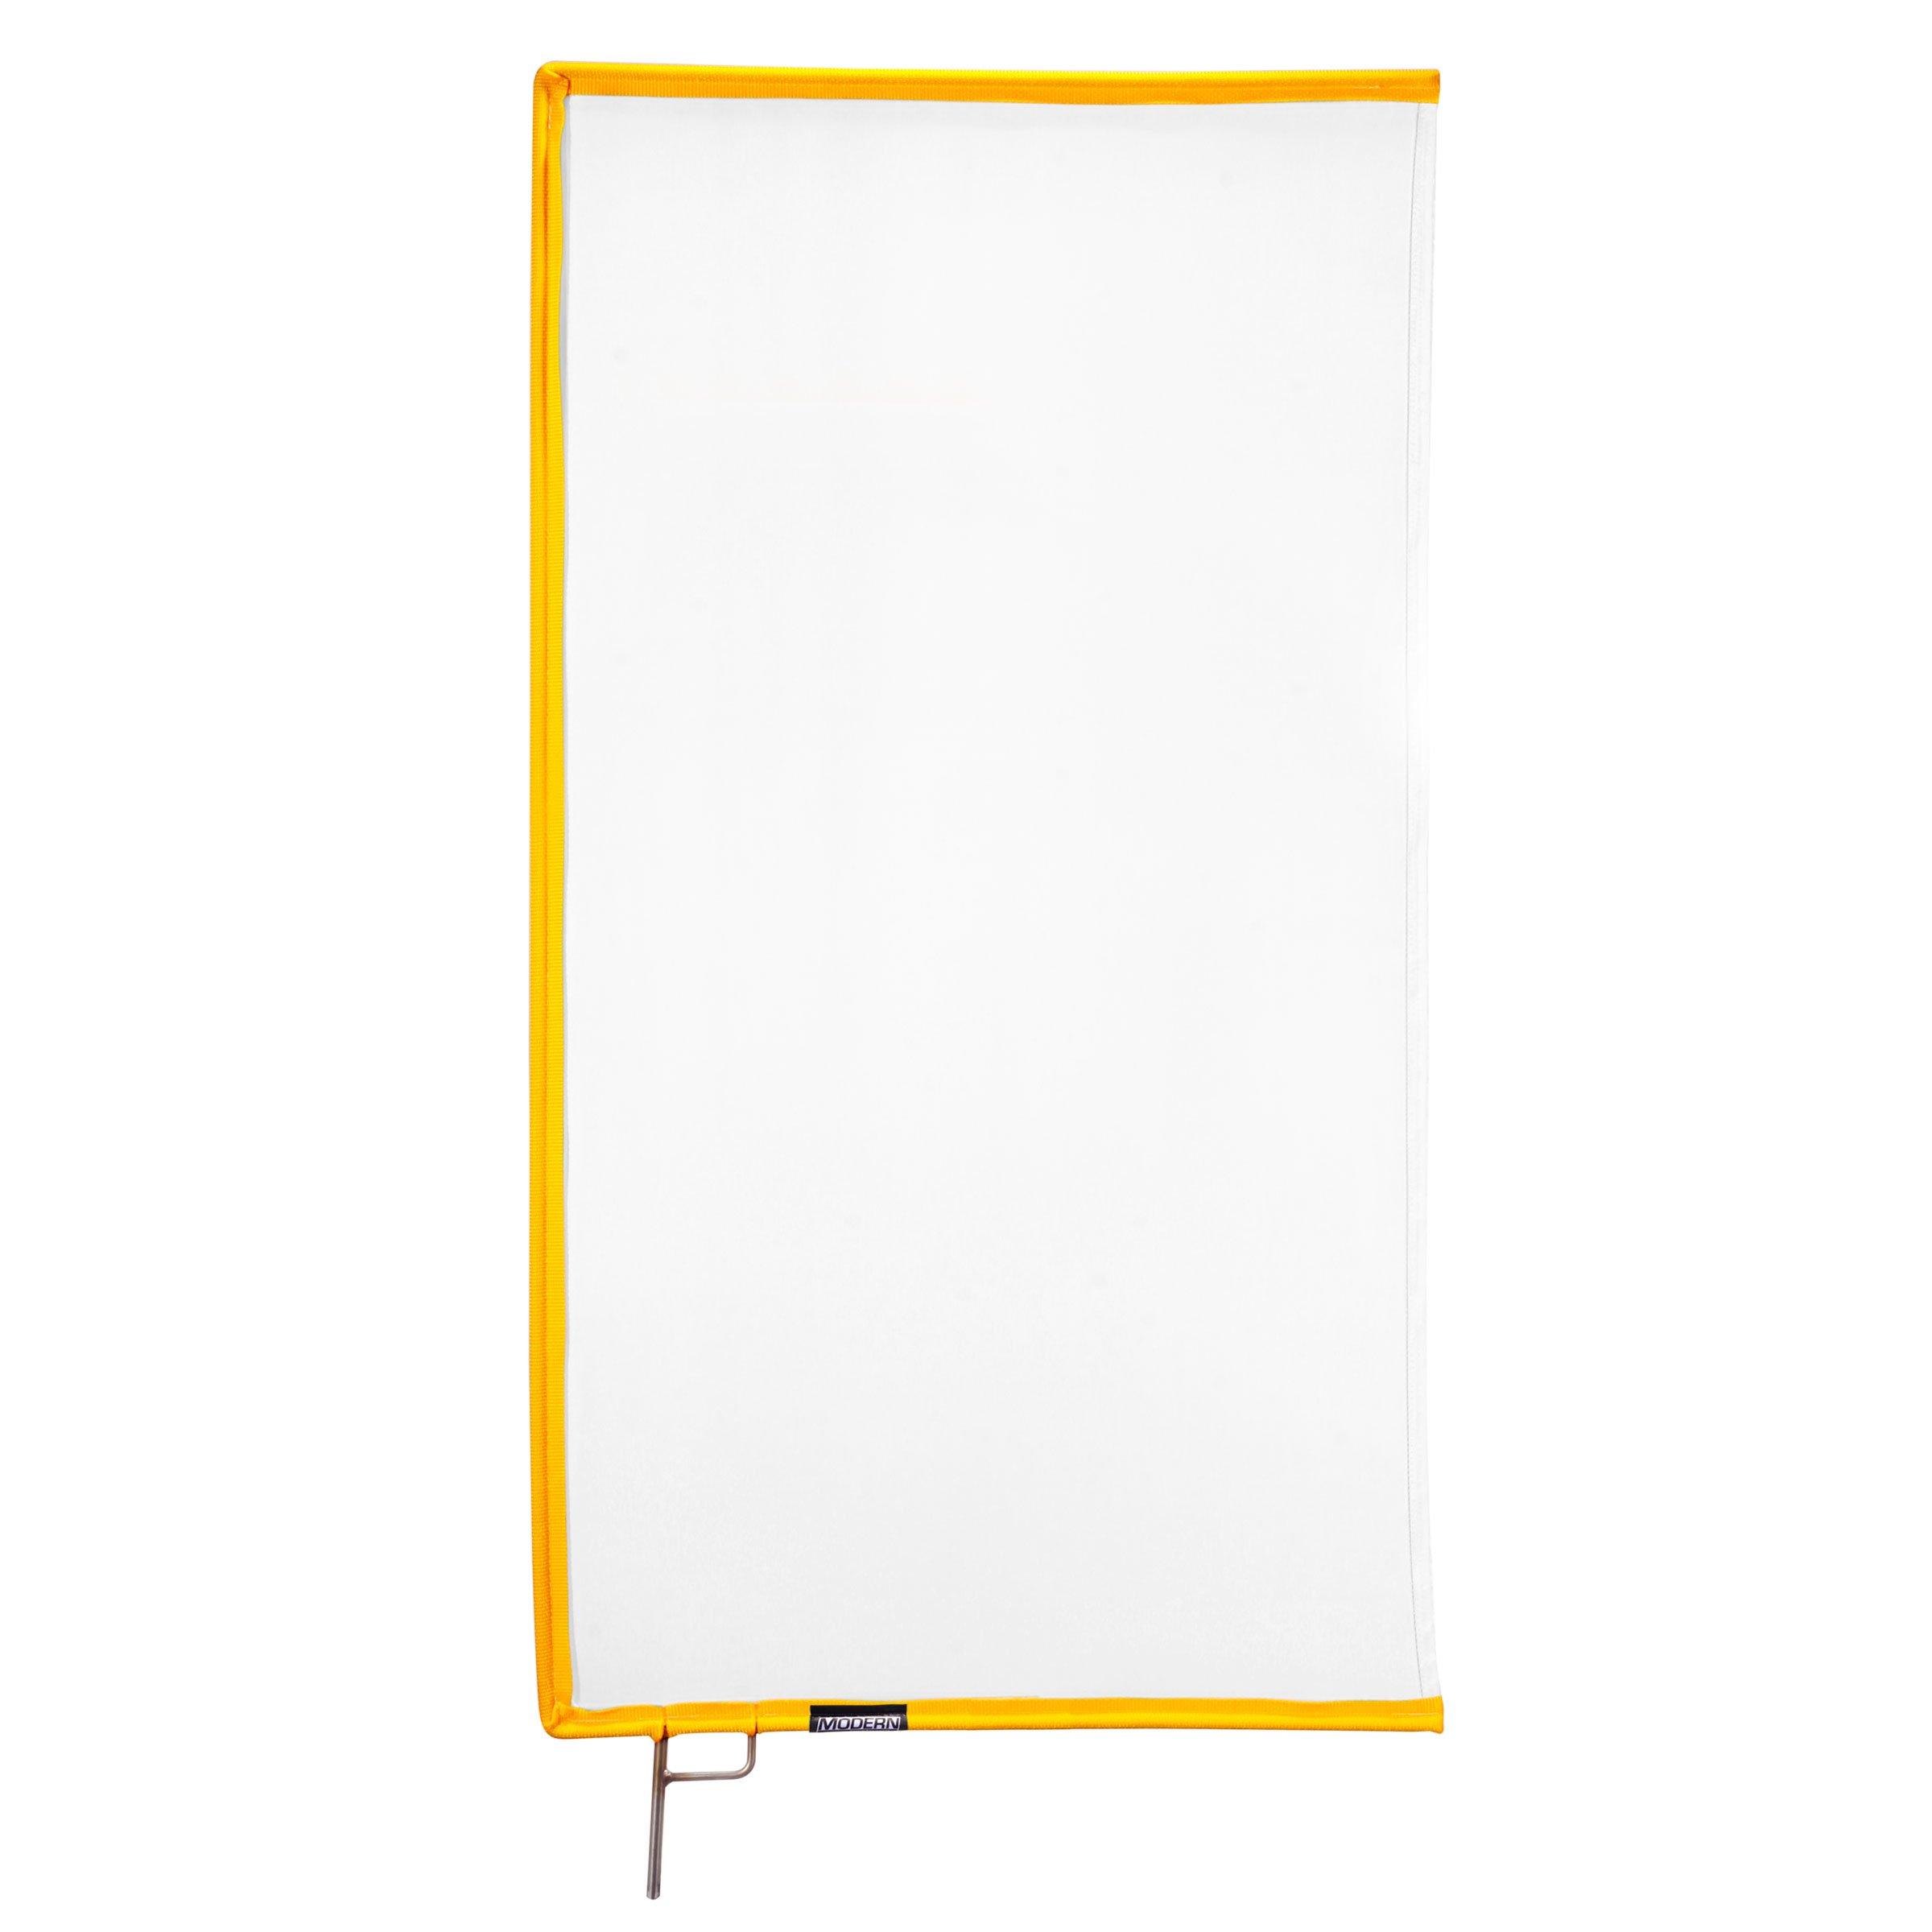 Silk Quarter White 18″ x 24″ (blanc)